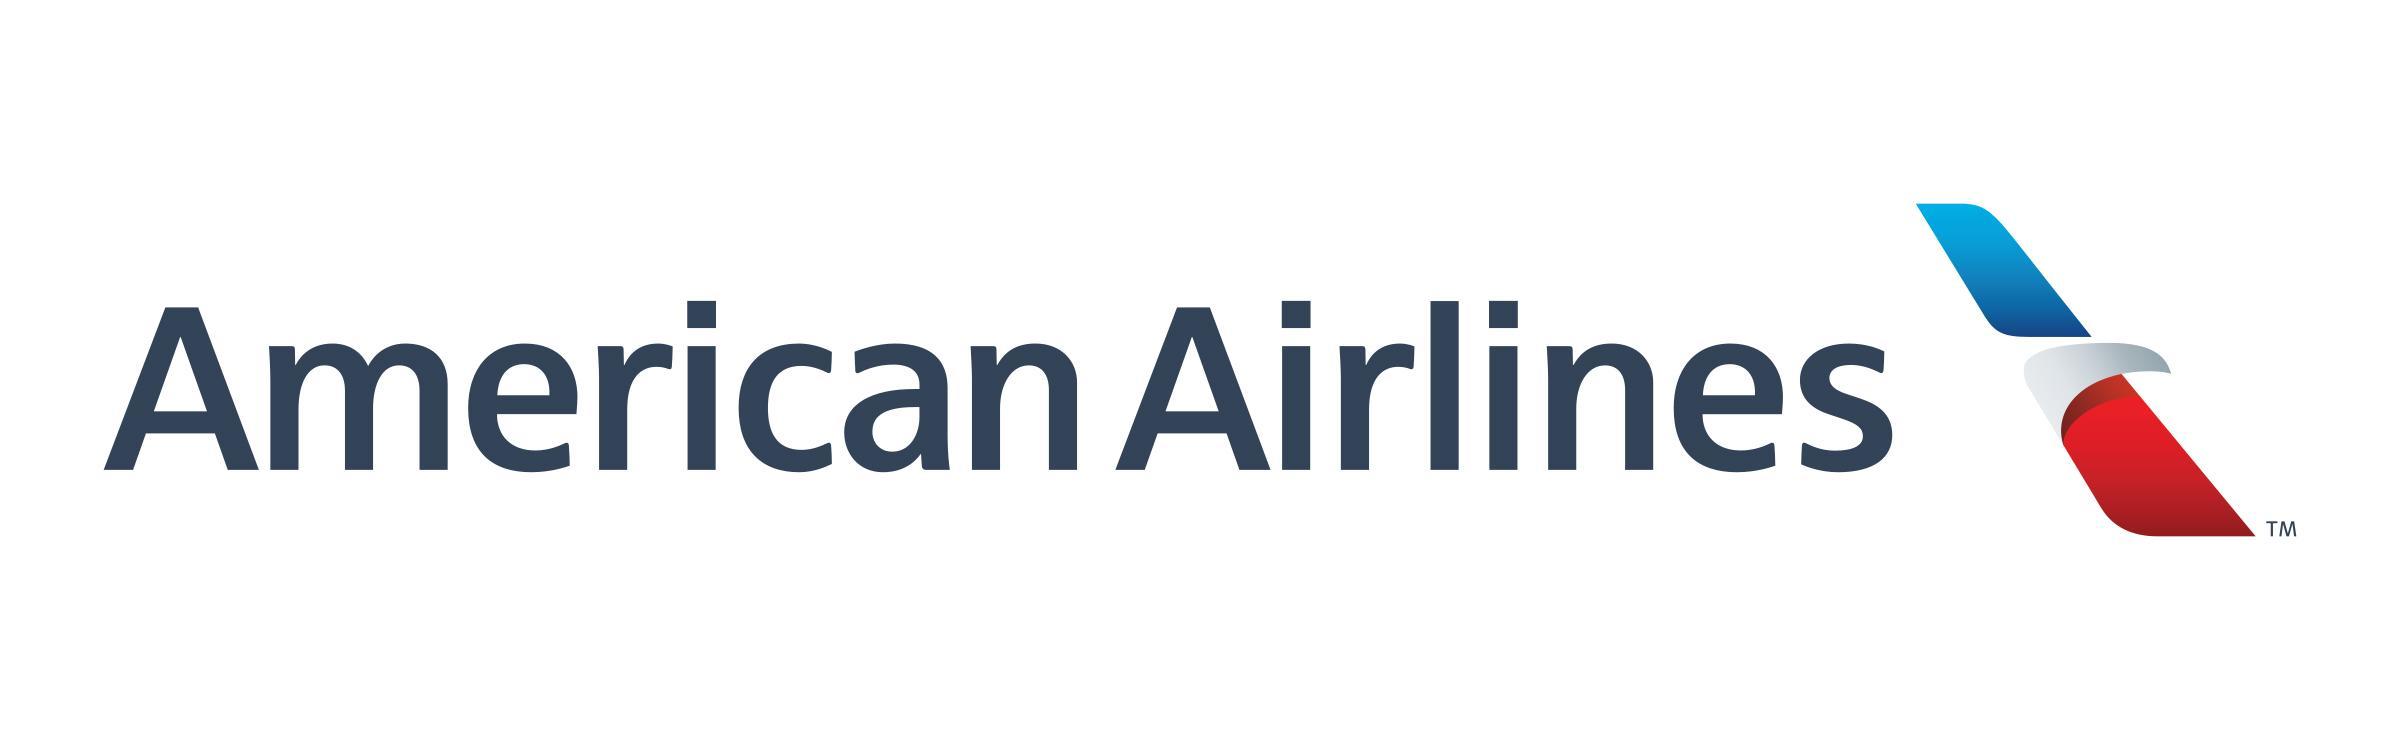 American Airlines rebrand by FutureBrand